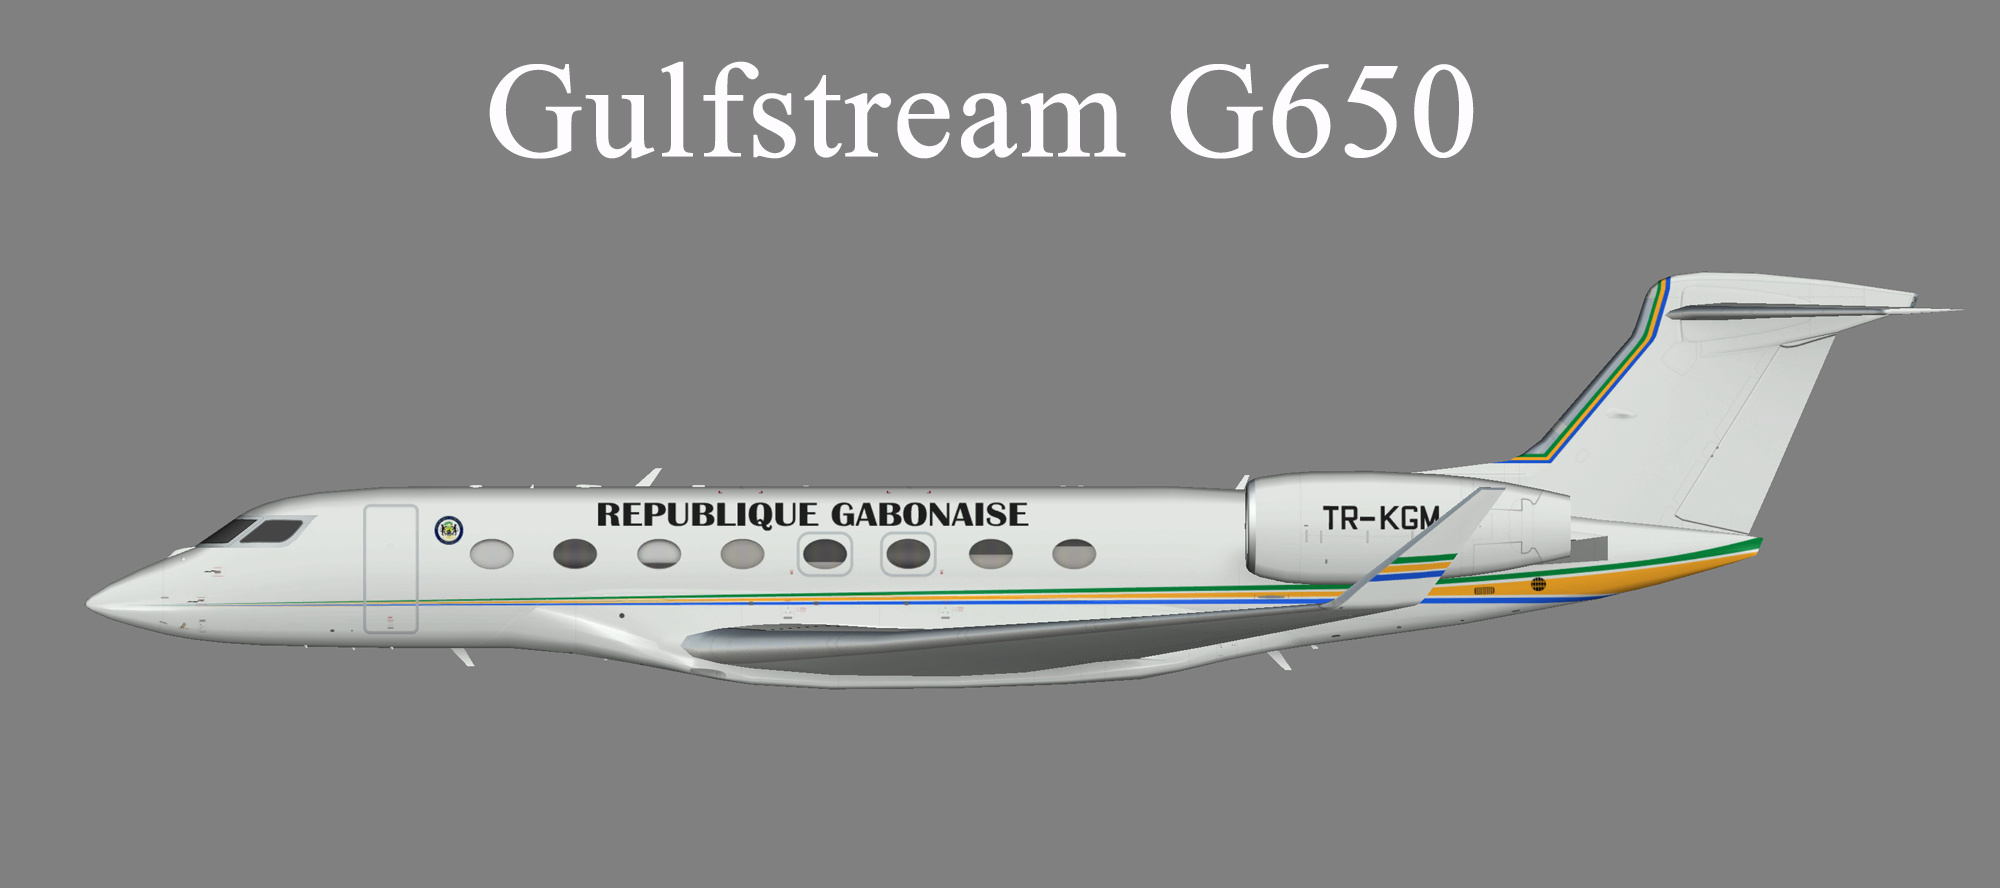 Gabon Government Gulfstream G650